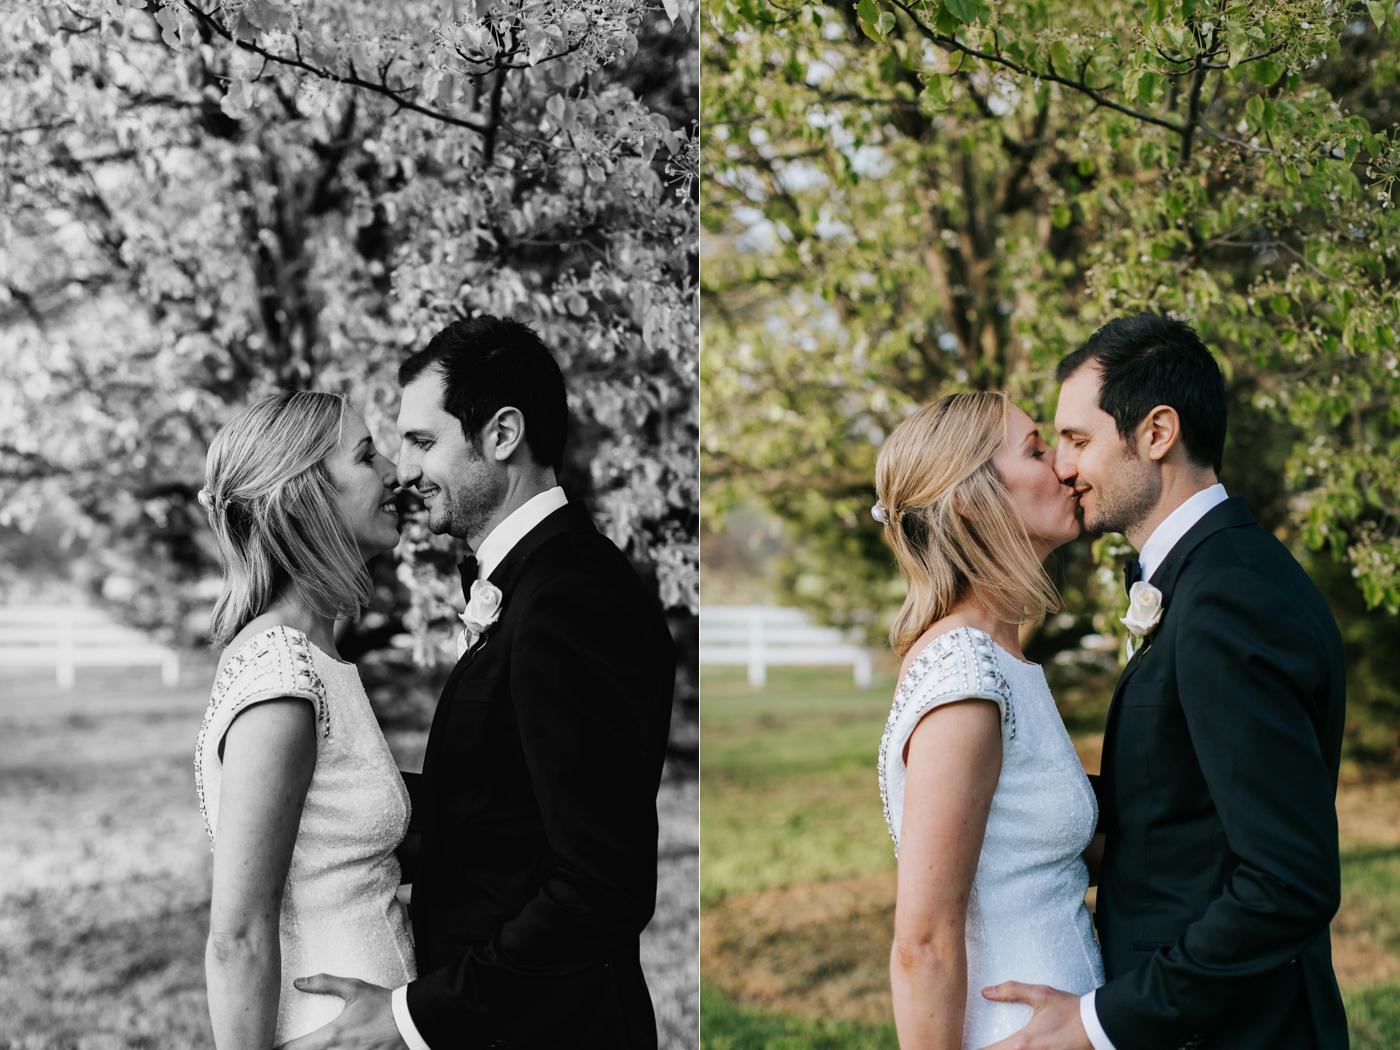 Bridget & James - Orange Country Wedding - Samantha Heather Photography-118.jpg